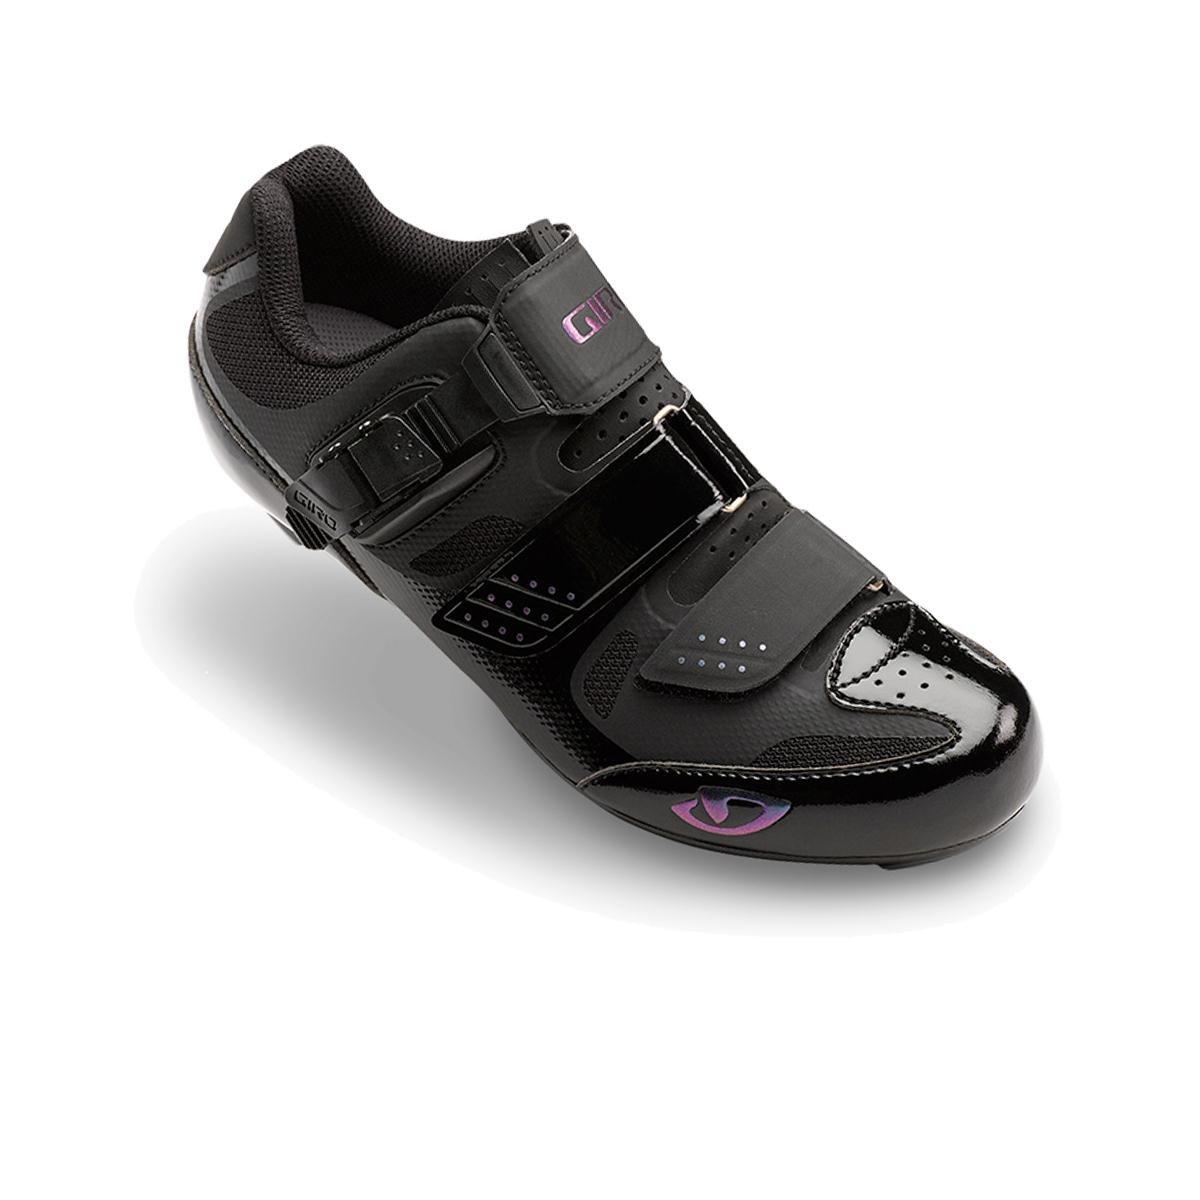 Giro Solara II Womens Road Cycling Shoes B015T744UA 37|Black